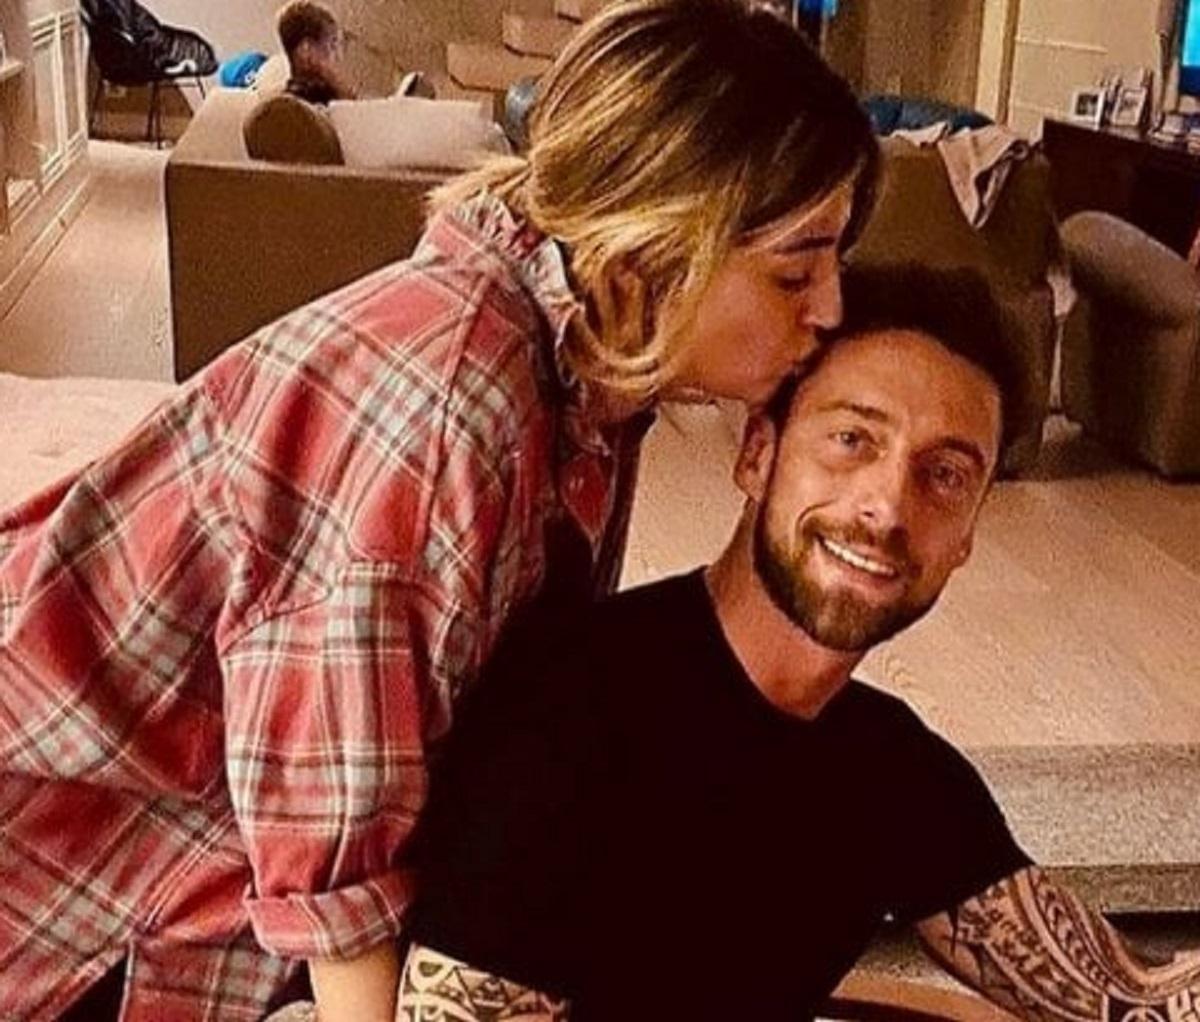 Claudio Marchisio moglie Roberta Sinopoli 13 anni matrimonio